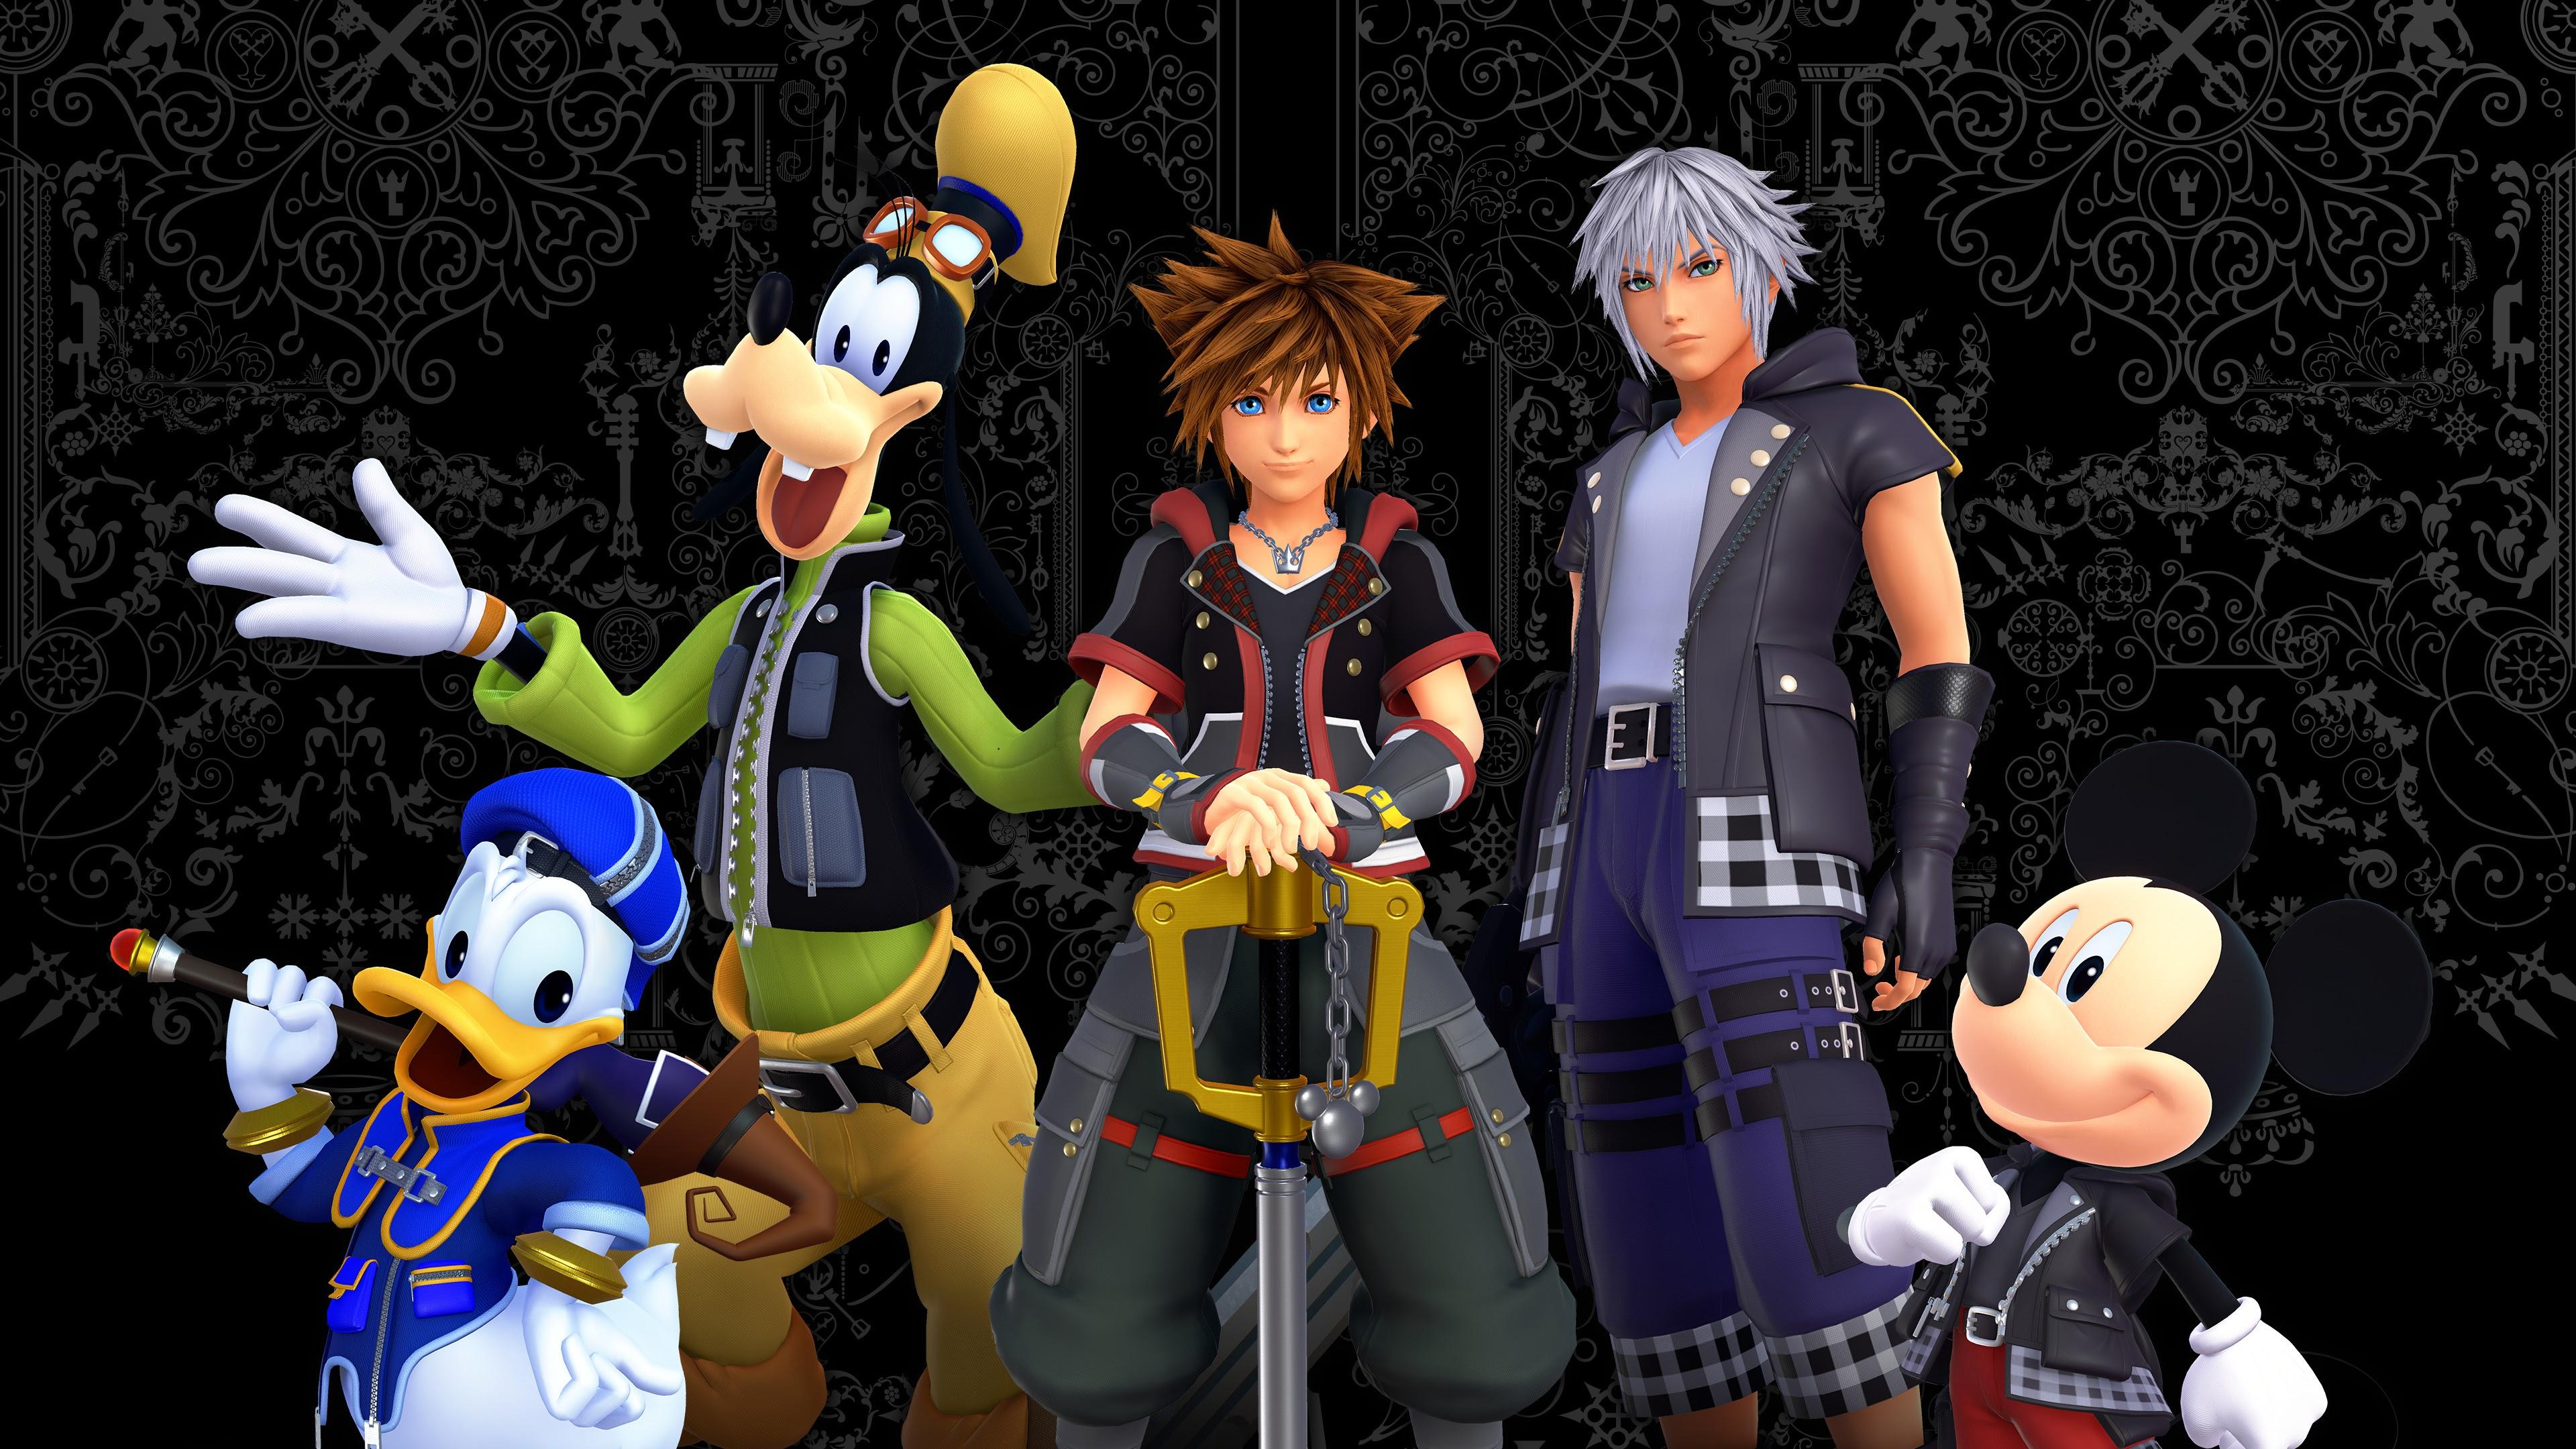 Kingdom Hearts 3 Characters 4k 3840x2160 Wallpaper 13